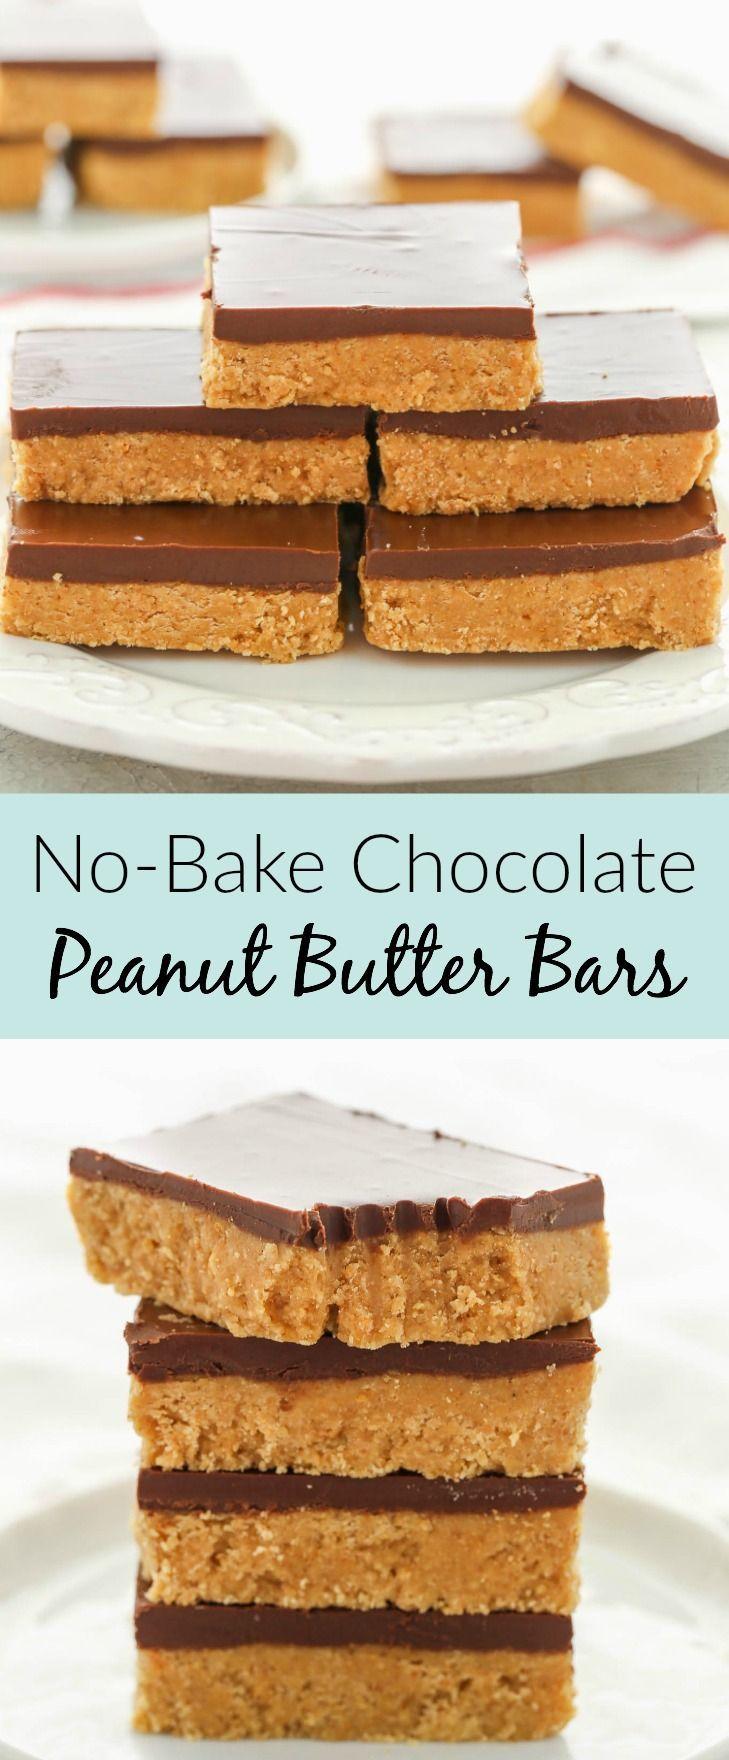 Diese No-Bake-Schokoladen-Erdnussbutter-Riegel erf…